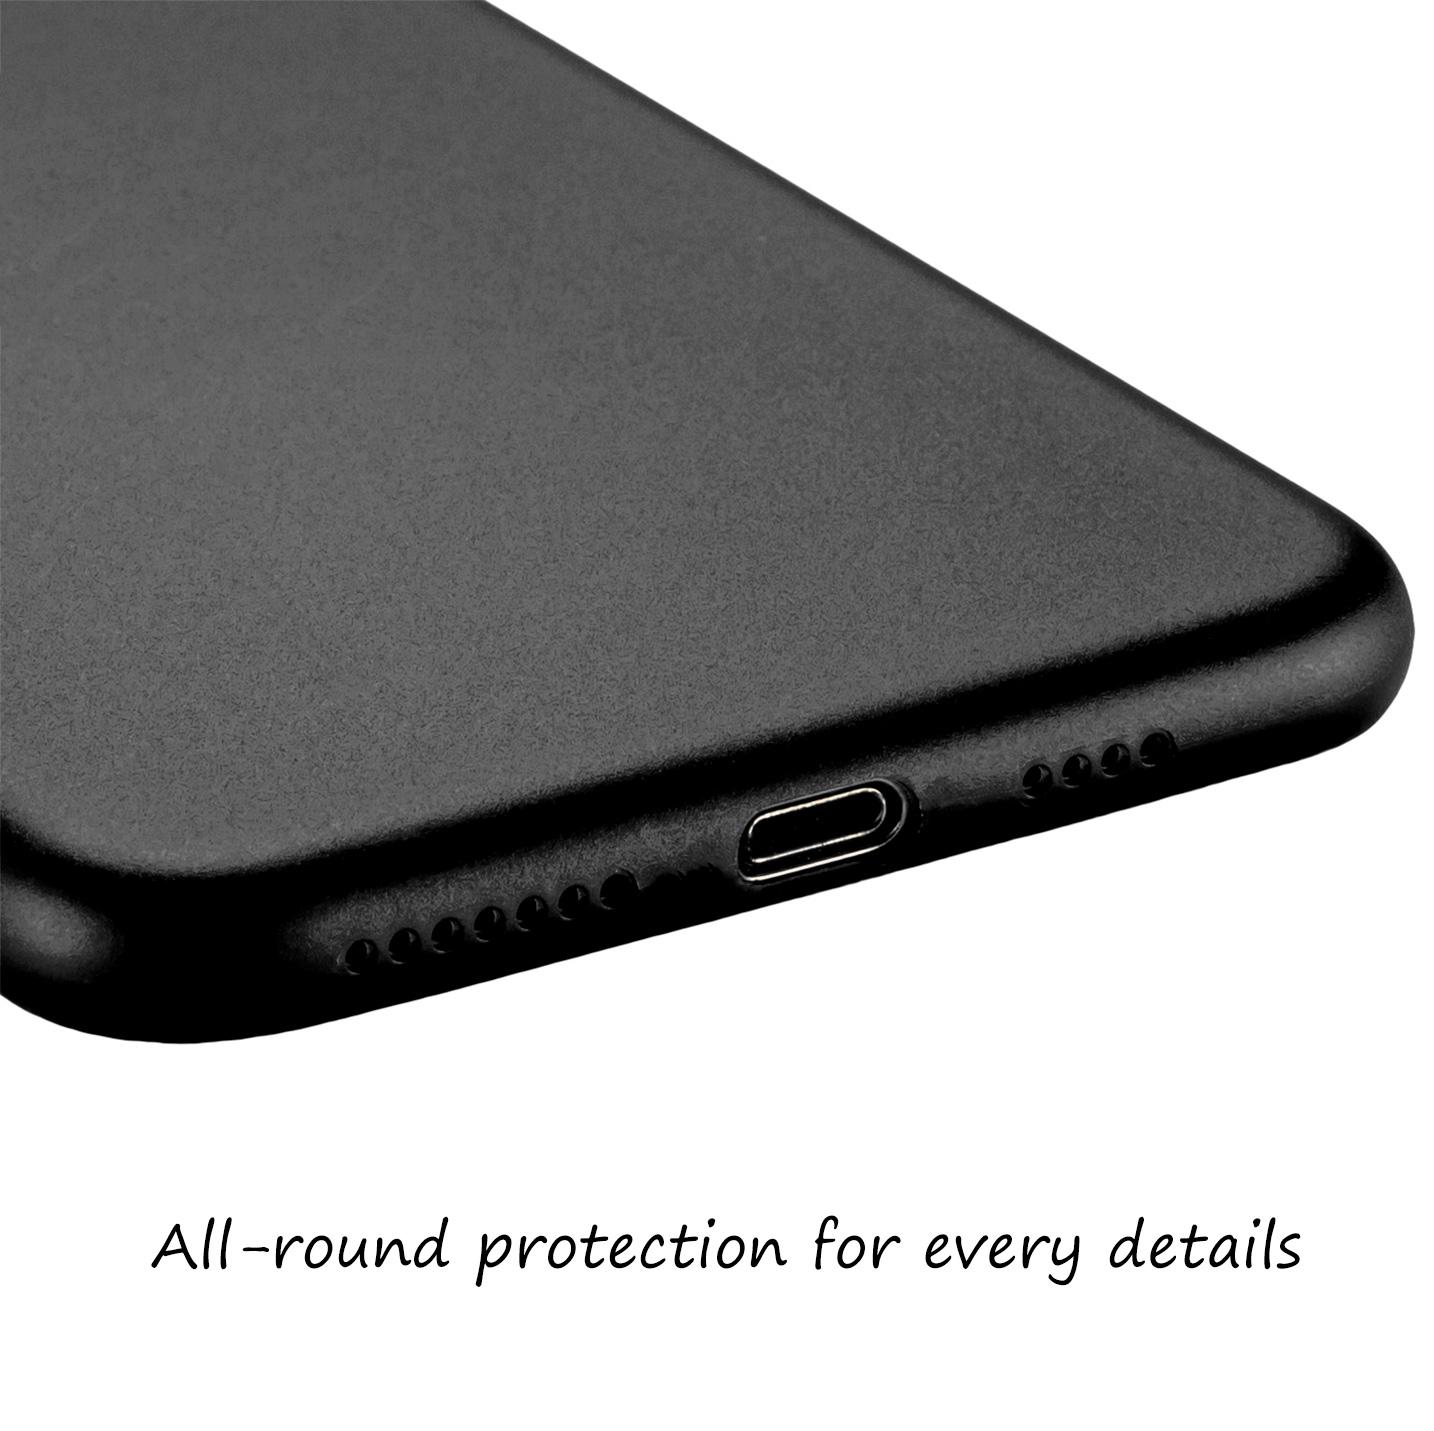 Ultra-Slim-Case-iPhone-11-Pro-5-8-034-Matt-Clear-Schutz-Huelle-Skin-Cover-Etui-Folie Indexbild 8